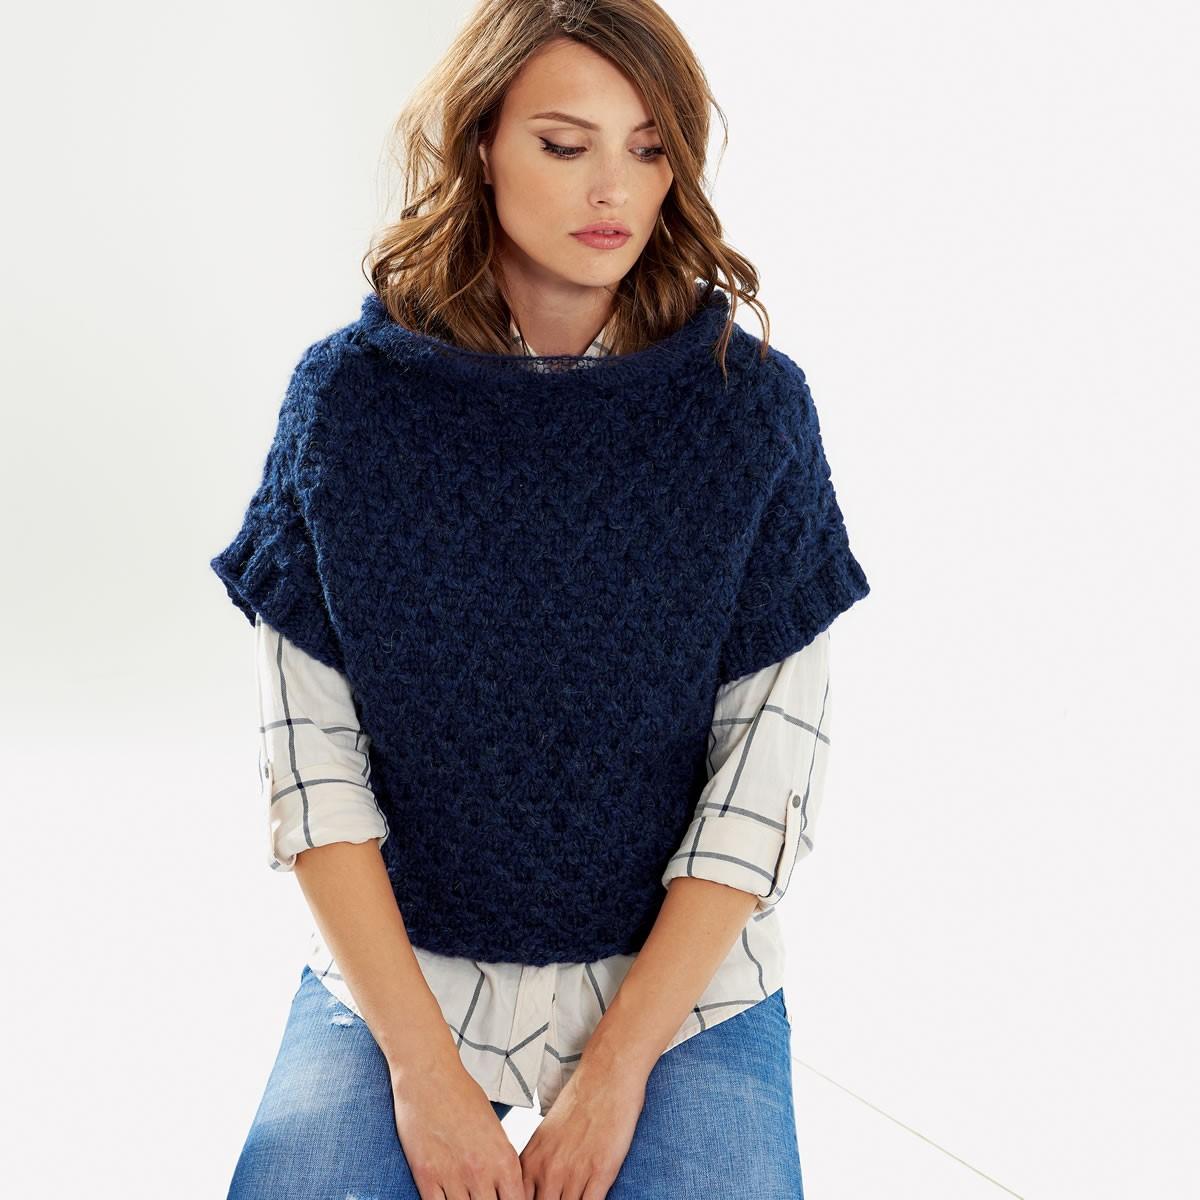 Lana Grossa Пуловер с рукавом-кимоно Alta Moda Superbaby/Silkhair